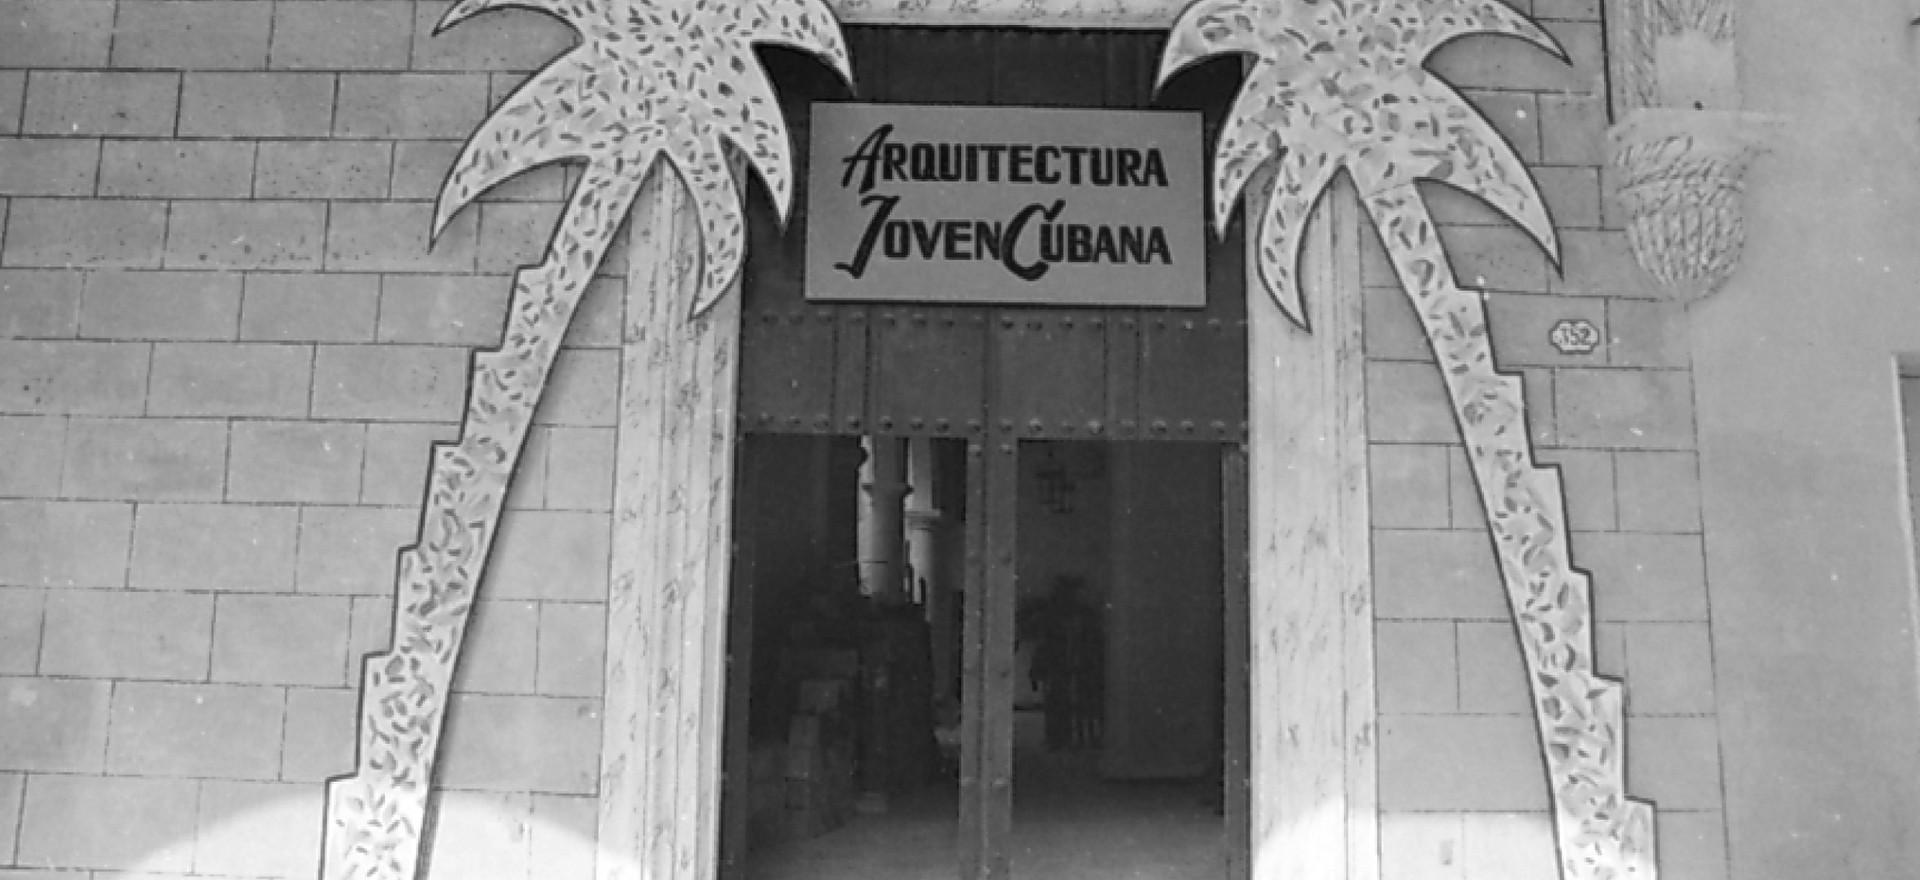 exposicion Arquitectura  joven cubana; Centro artes Visuales. La Habana. 1989